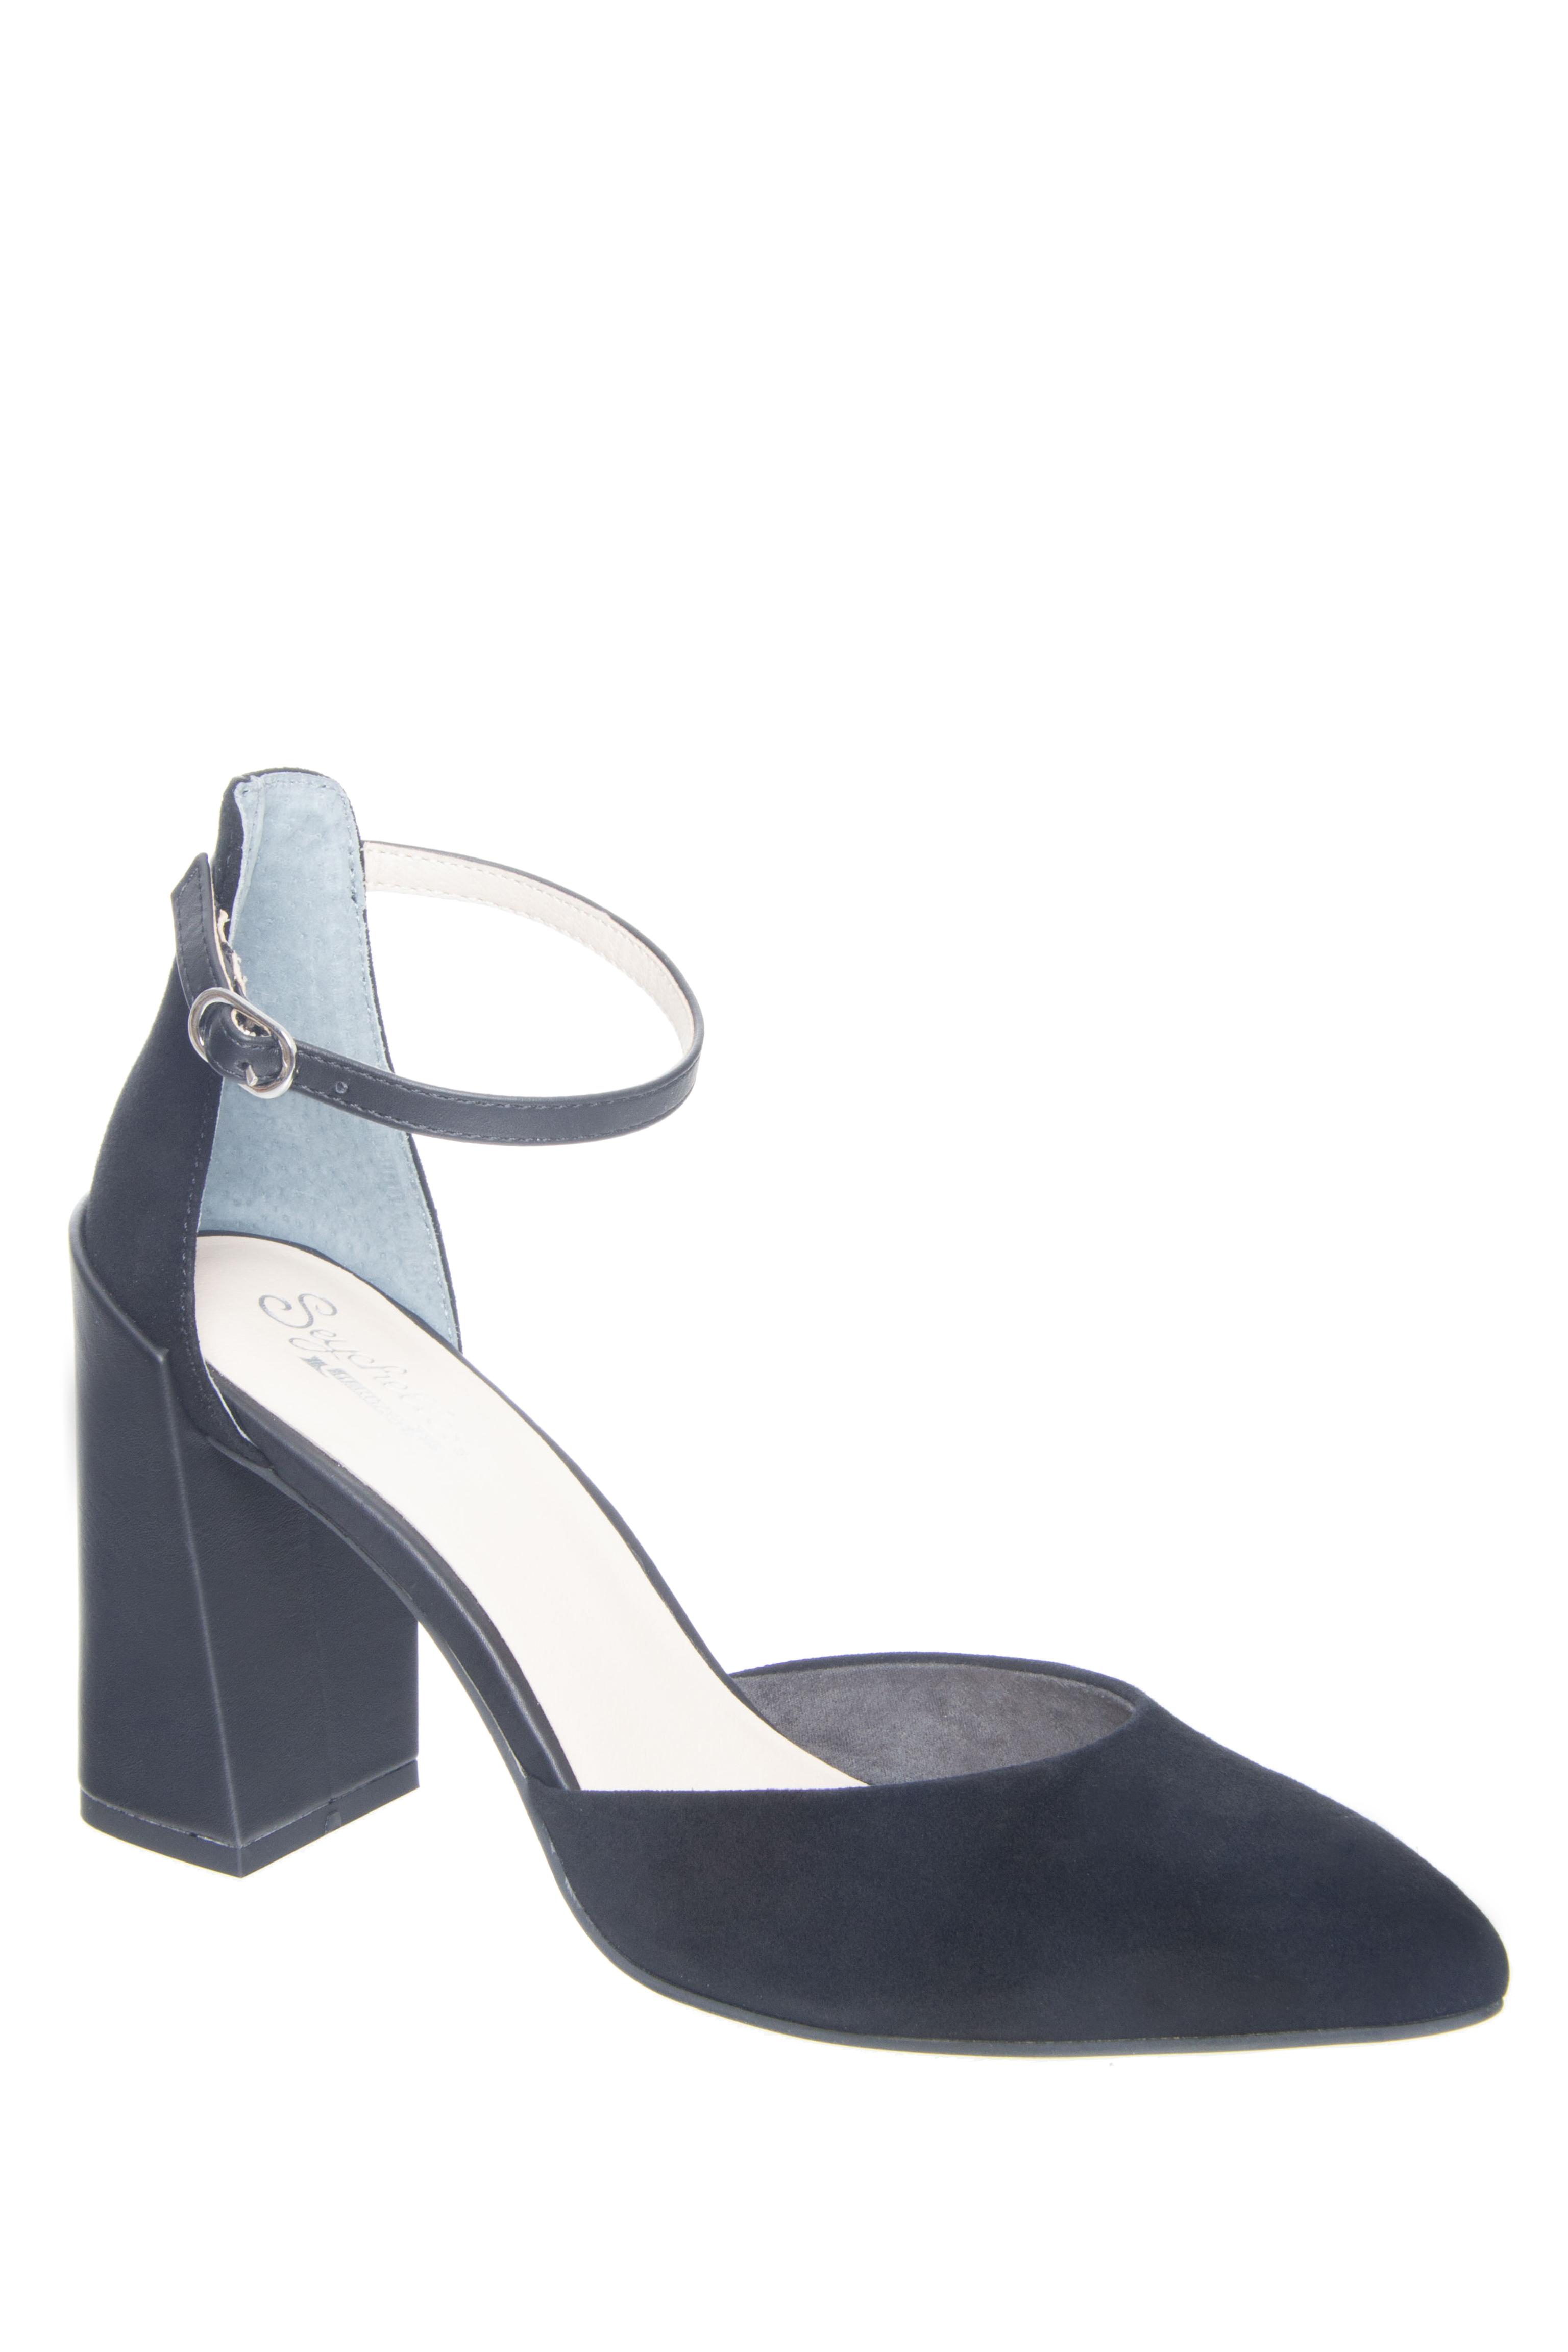 Seychelles Gaggle Stack Heels - Black